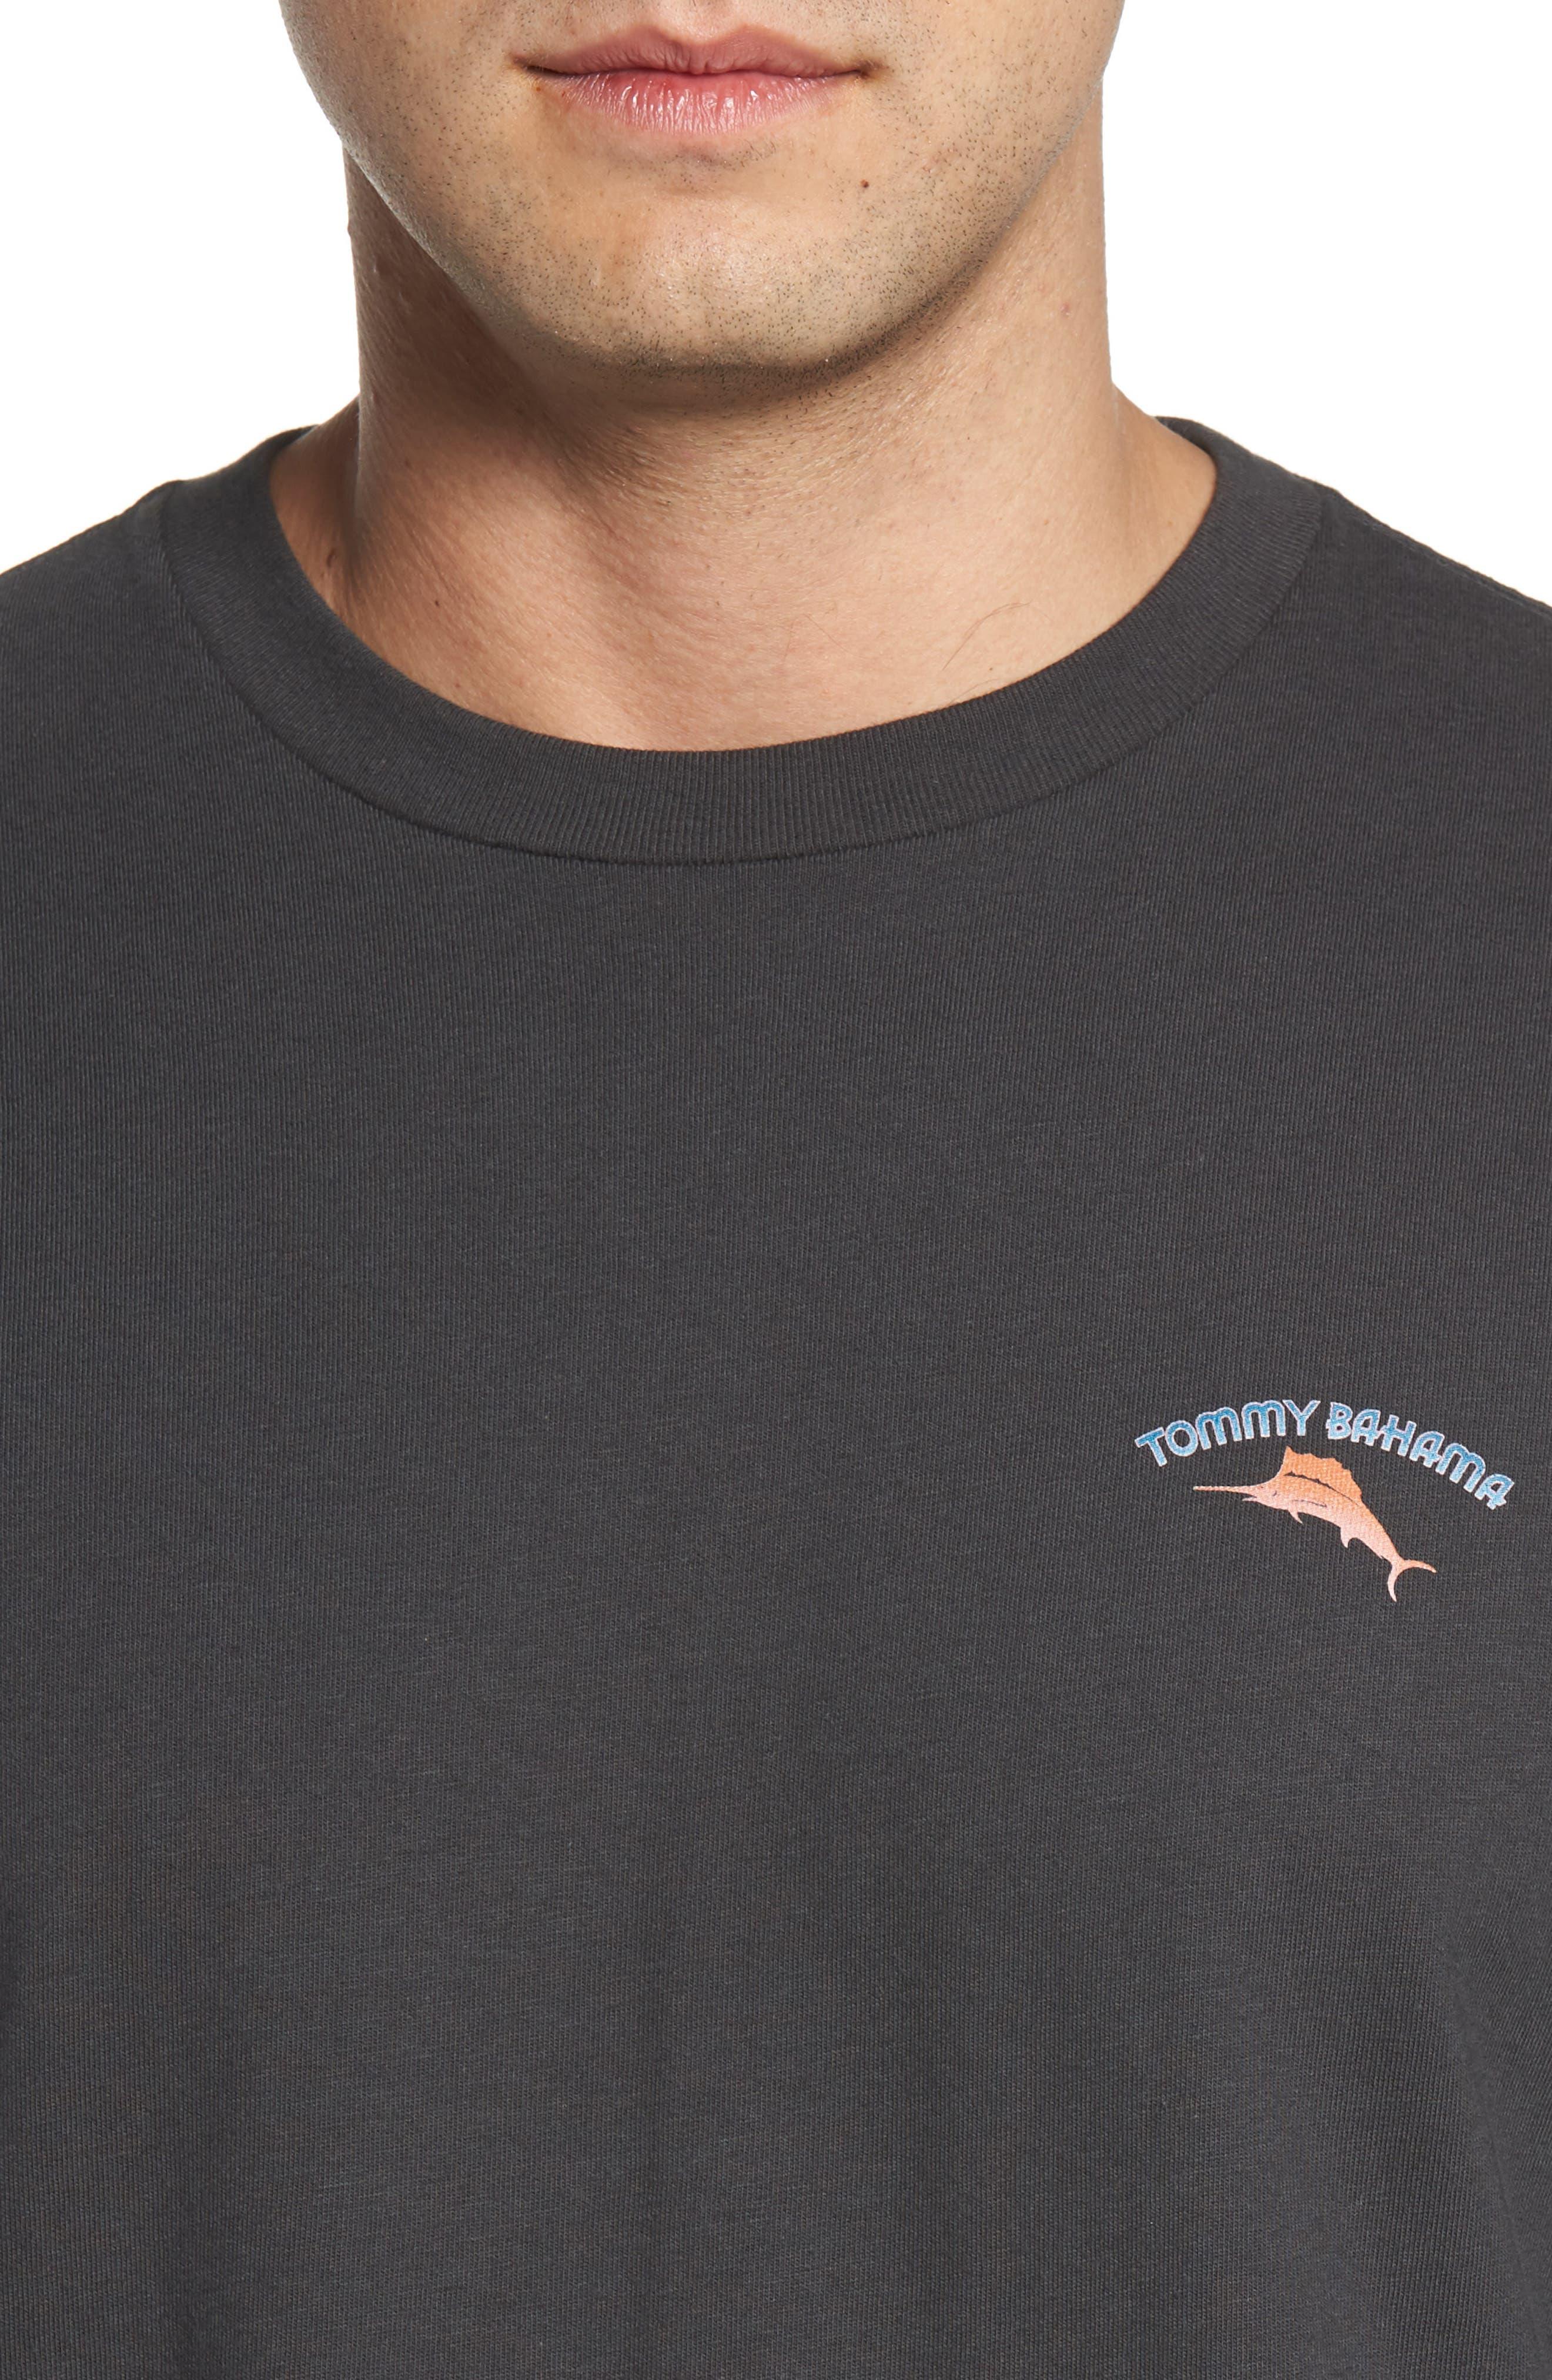 Bromingos T-Shirt,                             Alternate thumbnail 4, color,